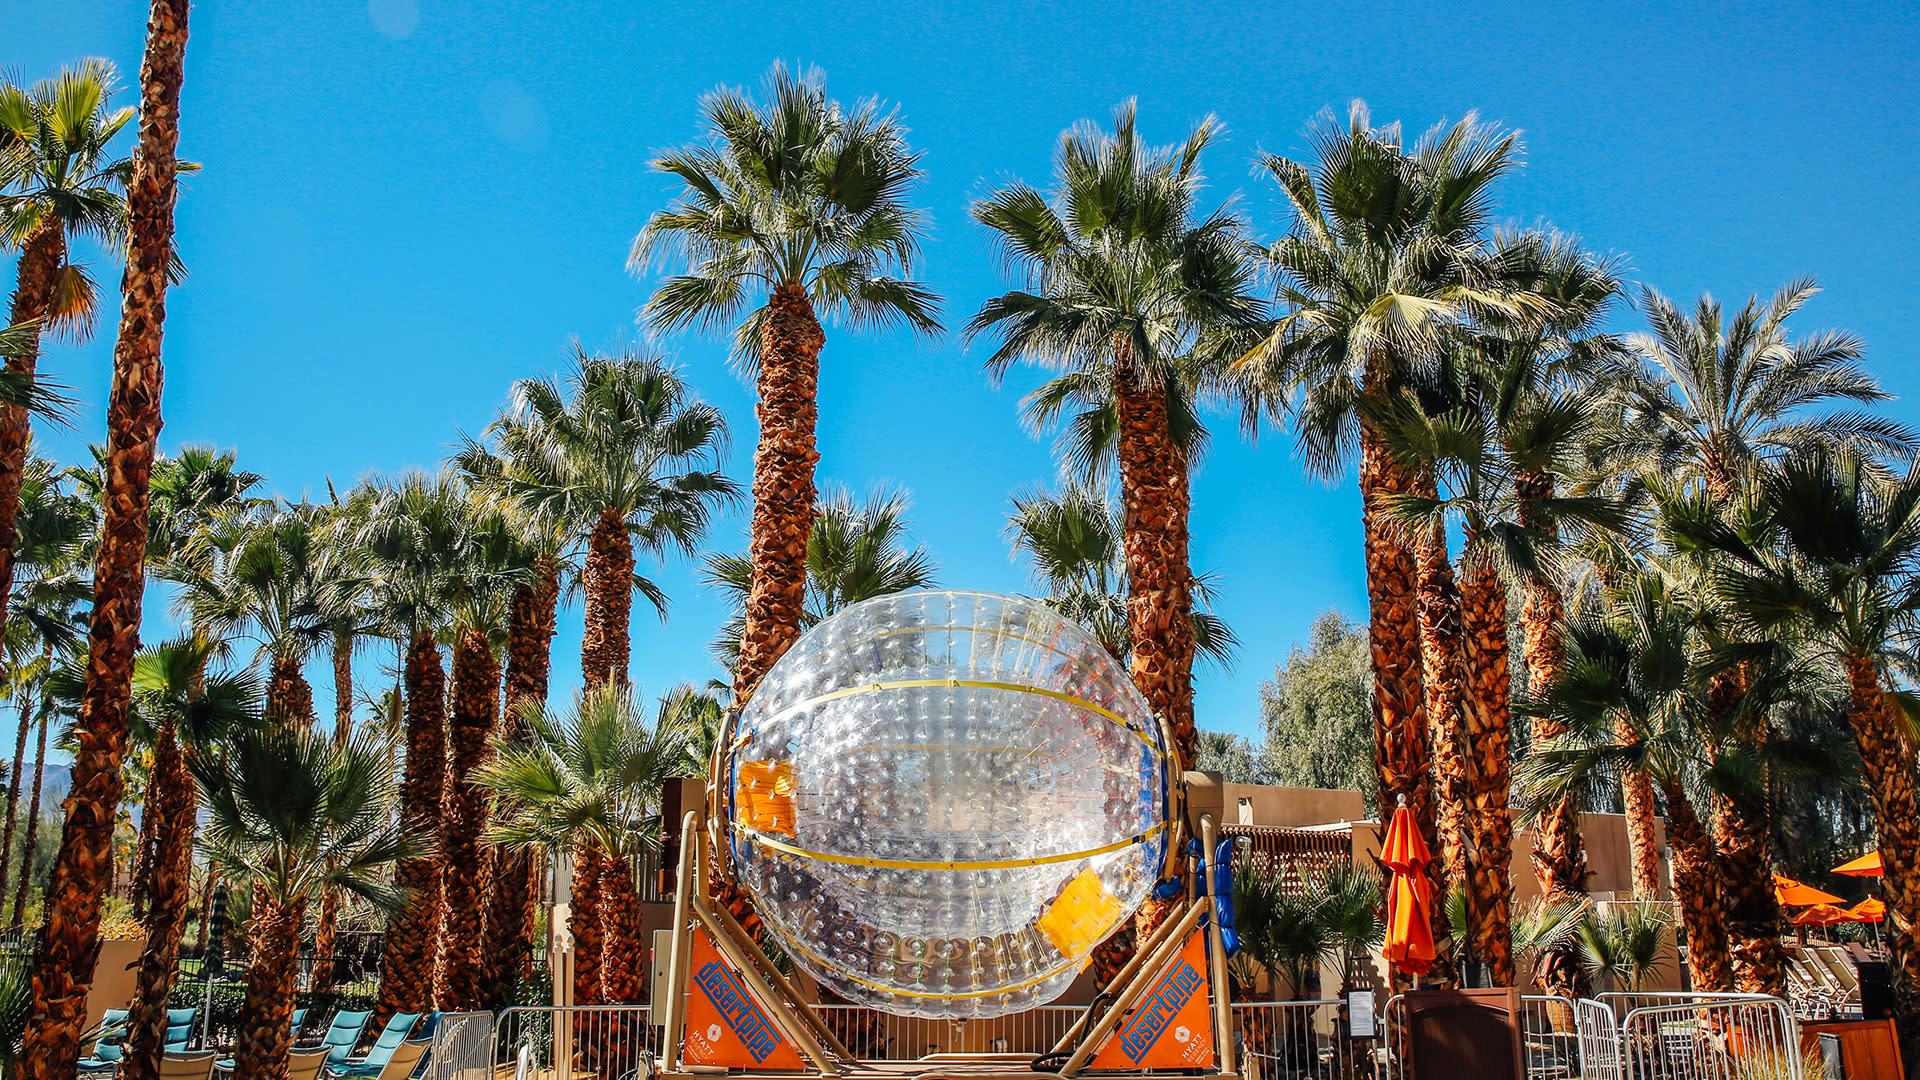 Have a ball inside DesertPipe at Hyatt Regency Indian Wells